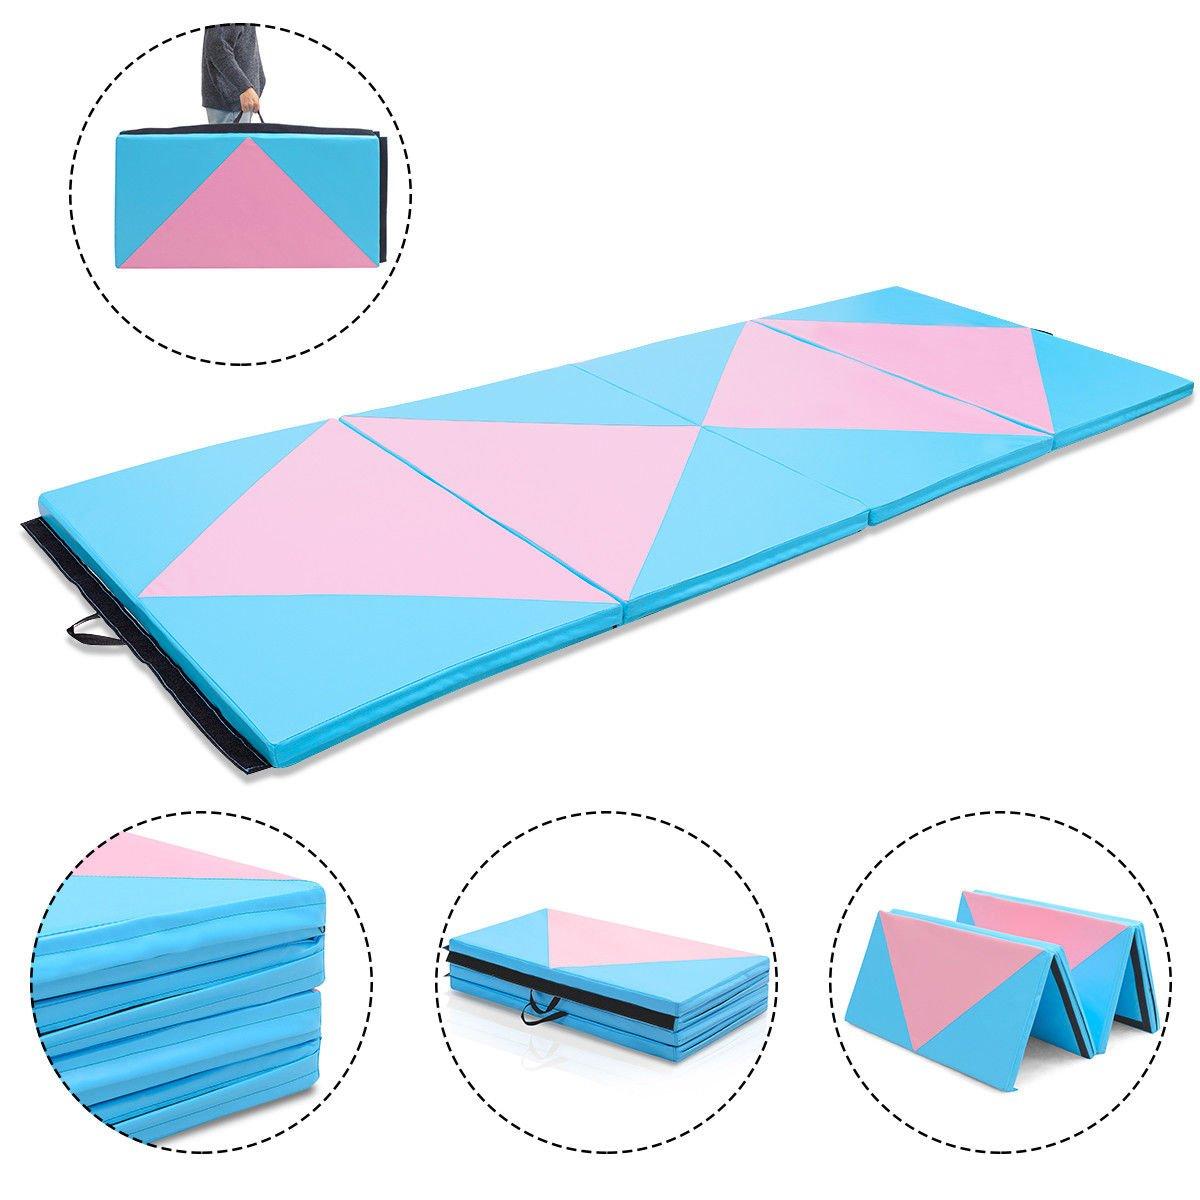 COSTWAY 4'X10'X2 Gymnastics Mat Folding Portable Aerobics Fitness Gym Exercise, Pink/Blue